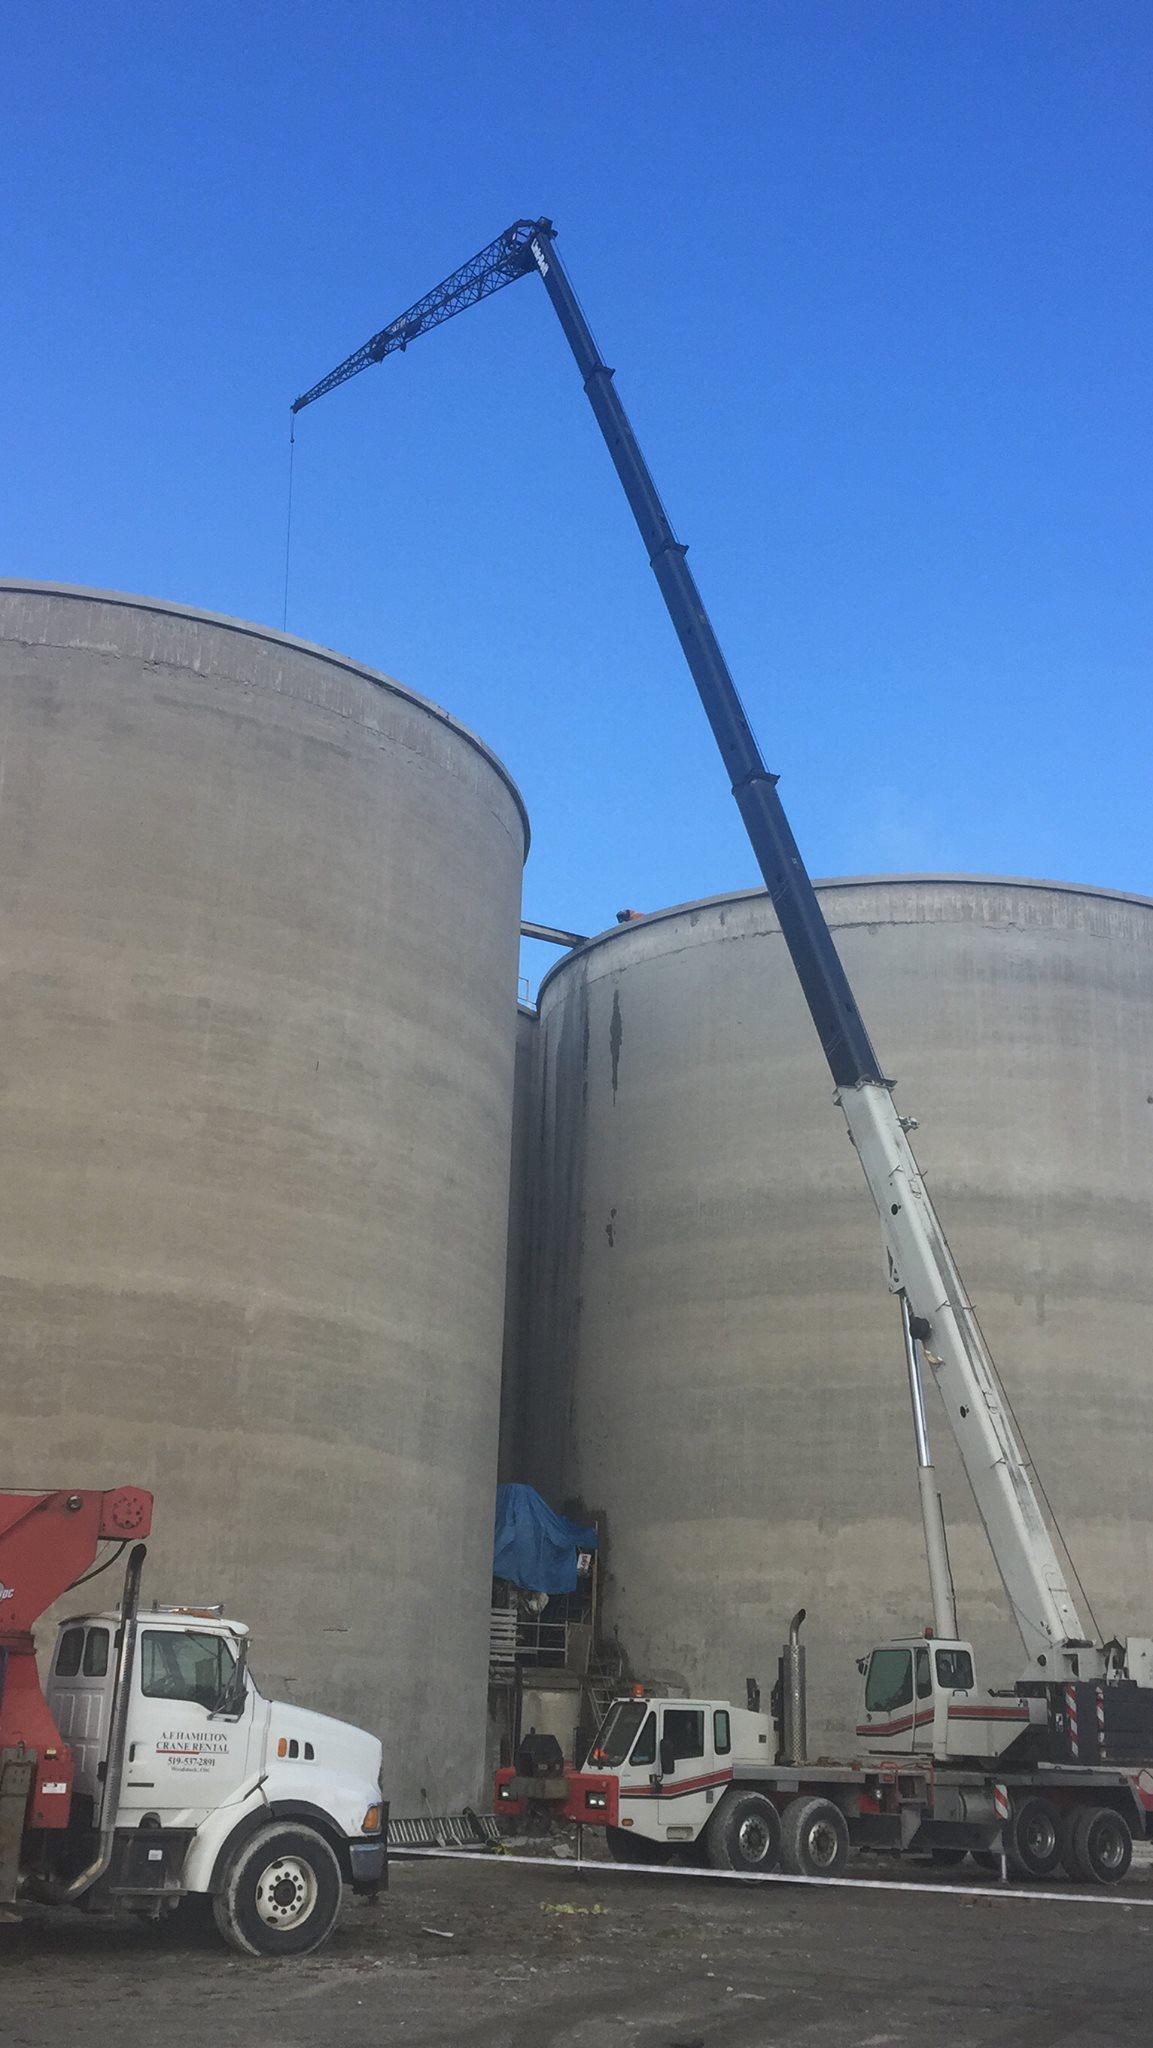 100 ton crane doing industrial millwright job